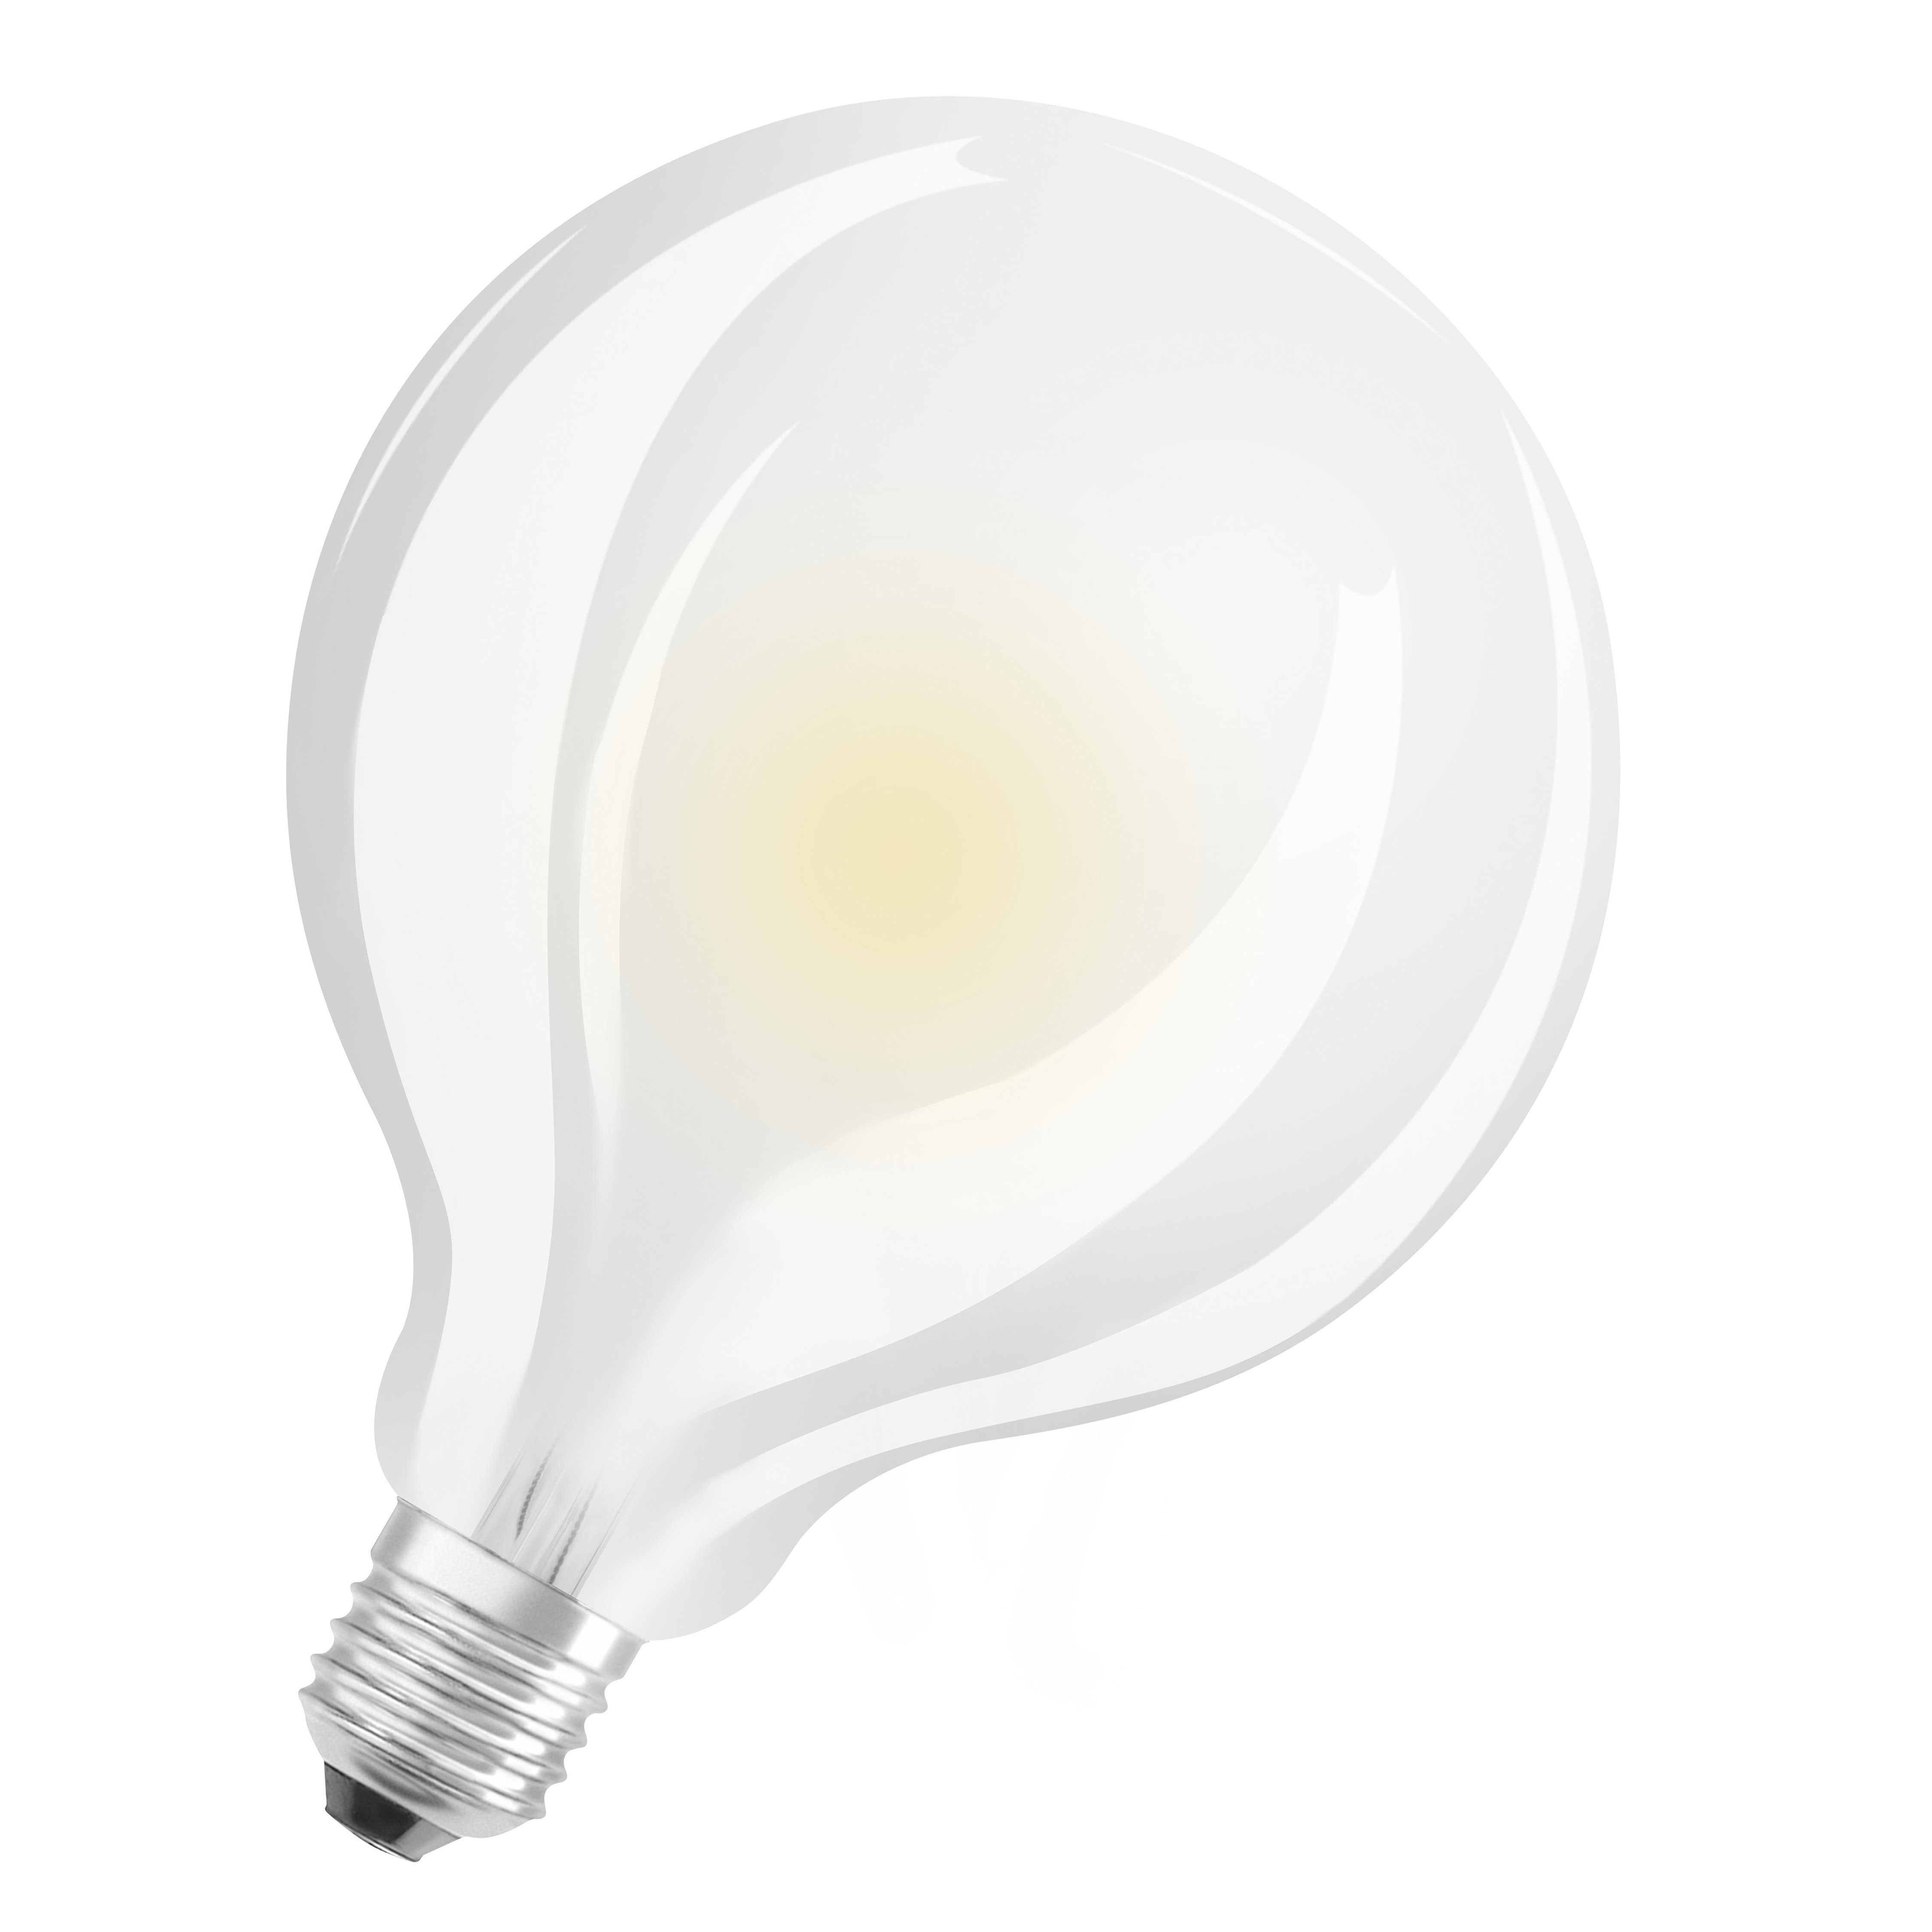 Osram LED Retrofit CLASSIC GLOBE Lampe, LED-Lampe »ST GLOBE 60 7 W/827 E27«